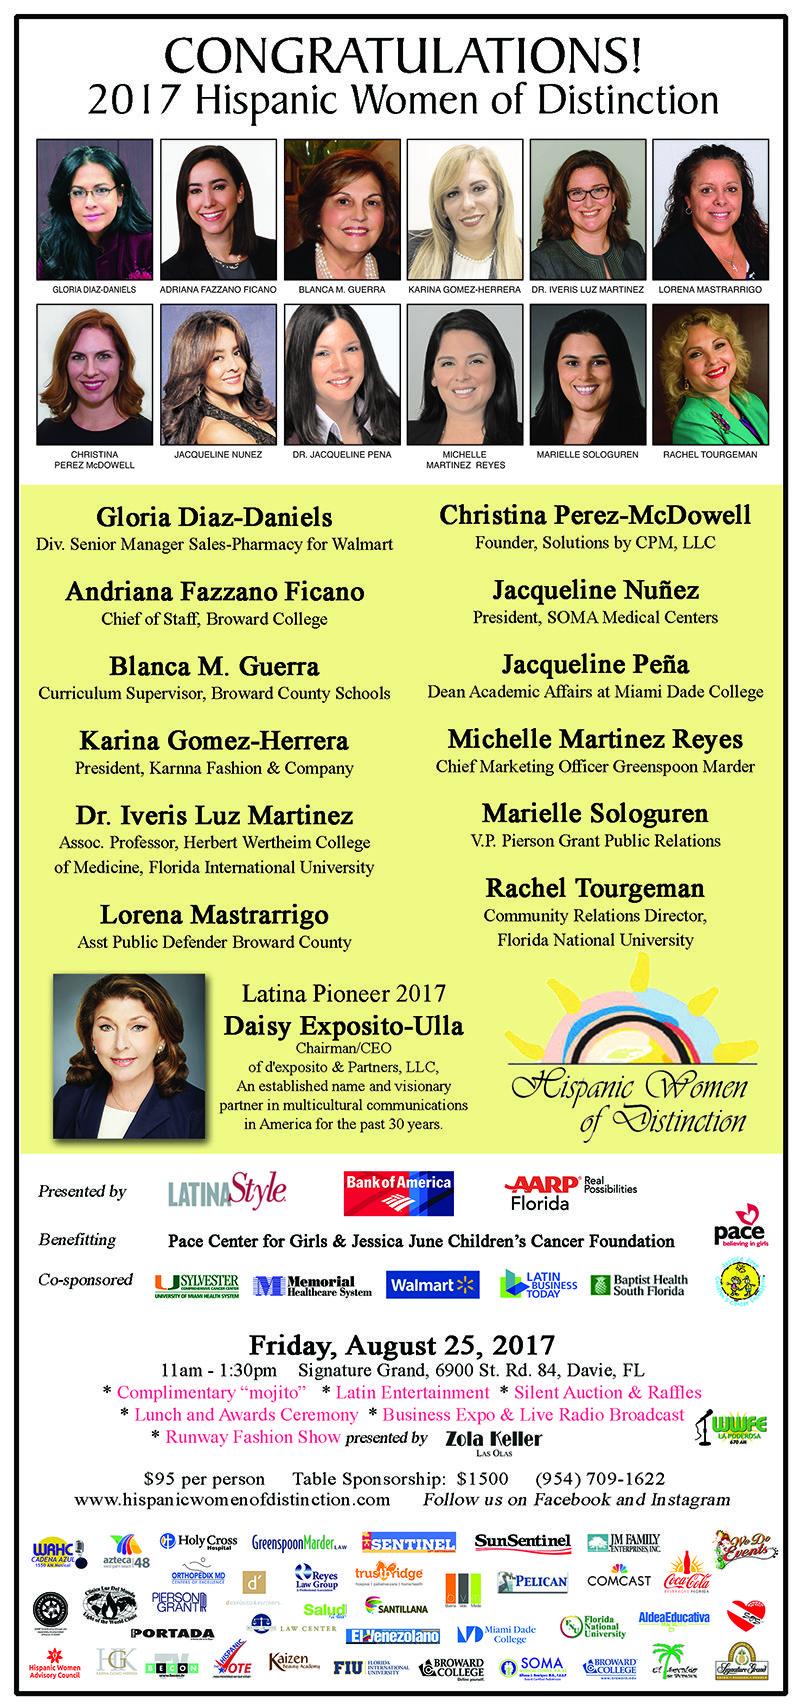 17th Annual Hispanic Women of Distinction